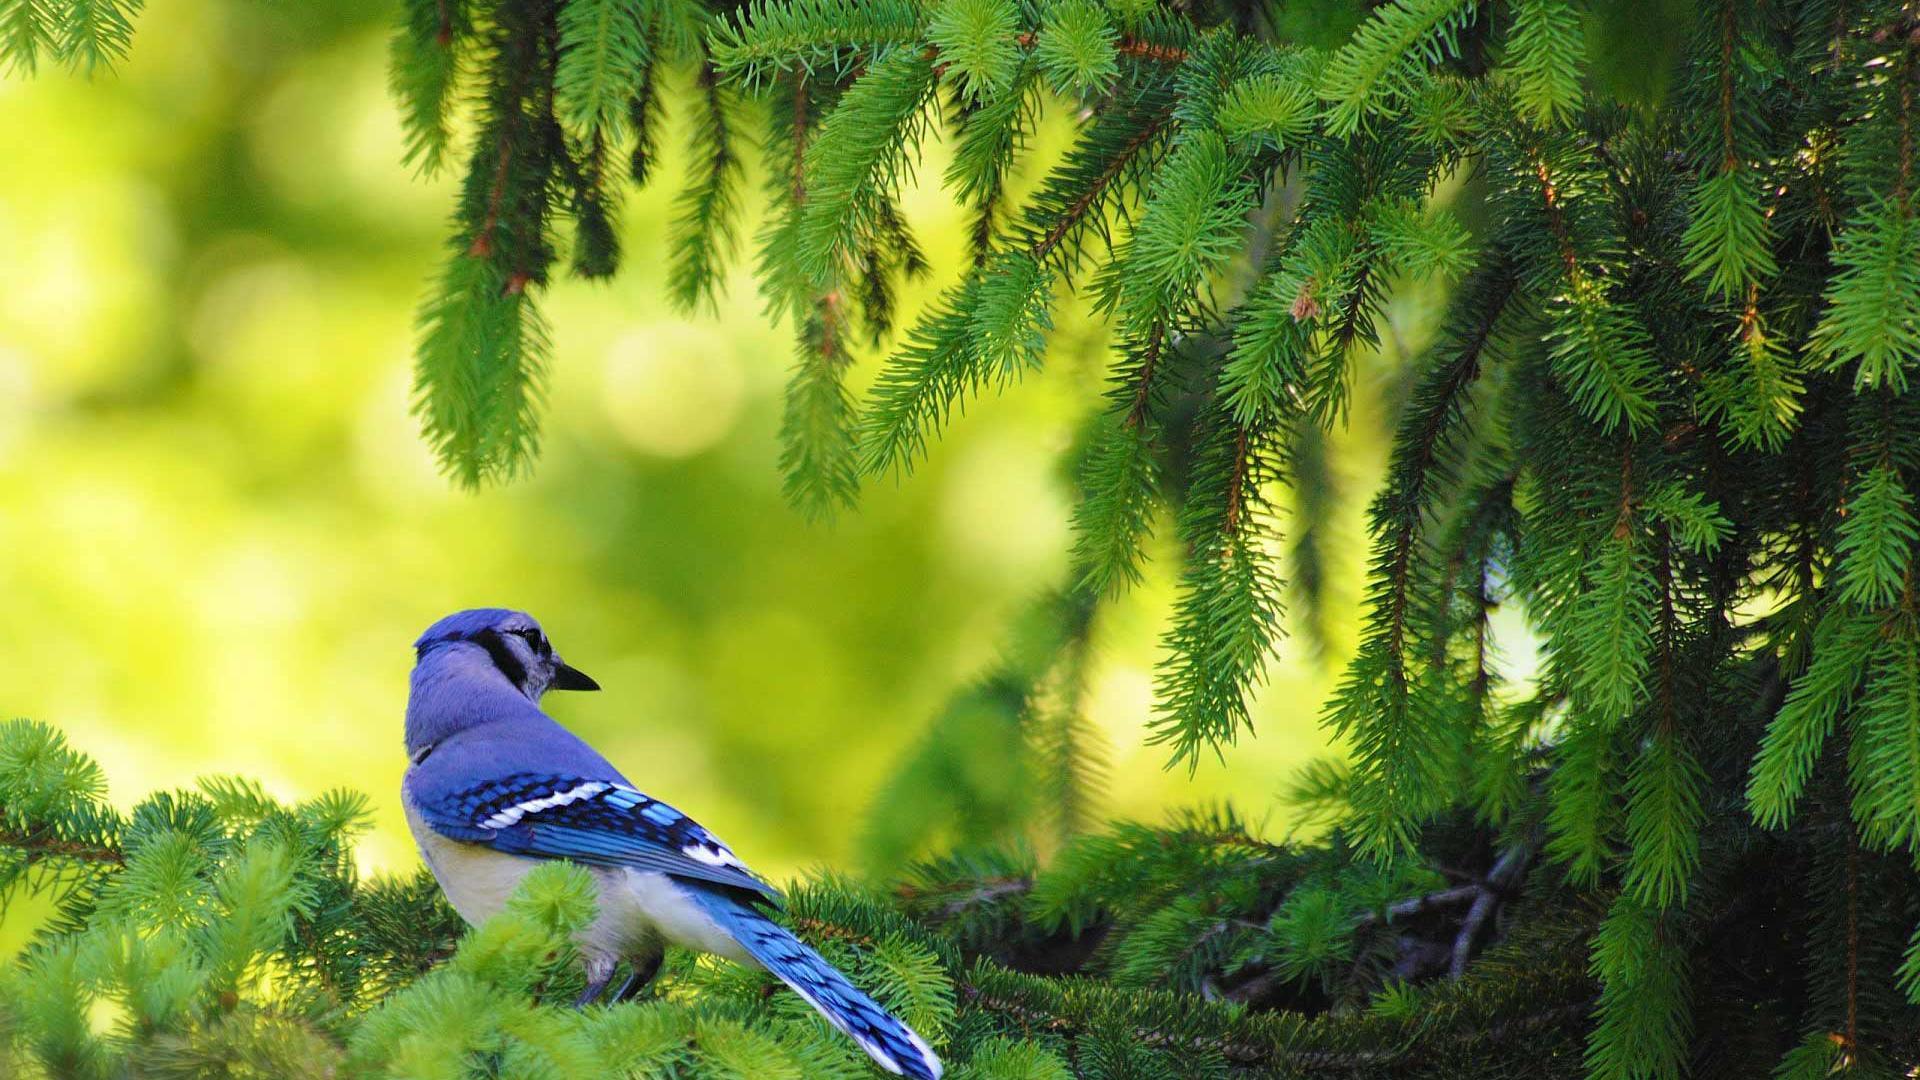 Natural Bird Images Hd 316292 Hd Wallpaper Backgrounds Download